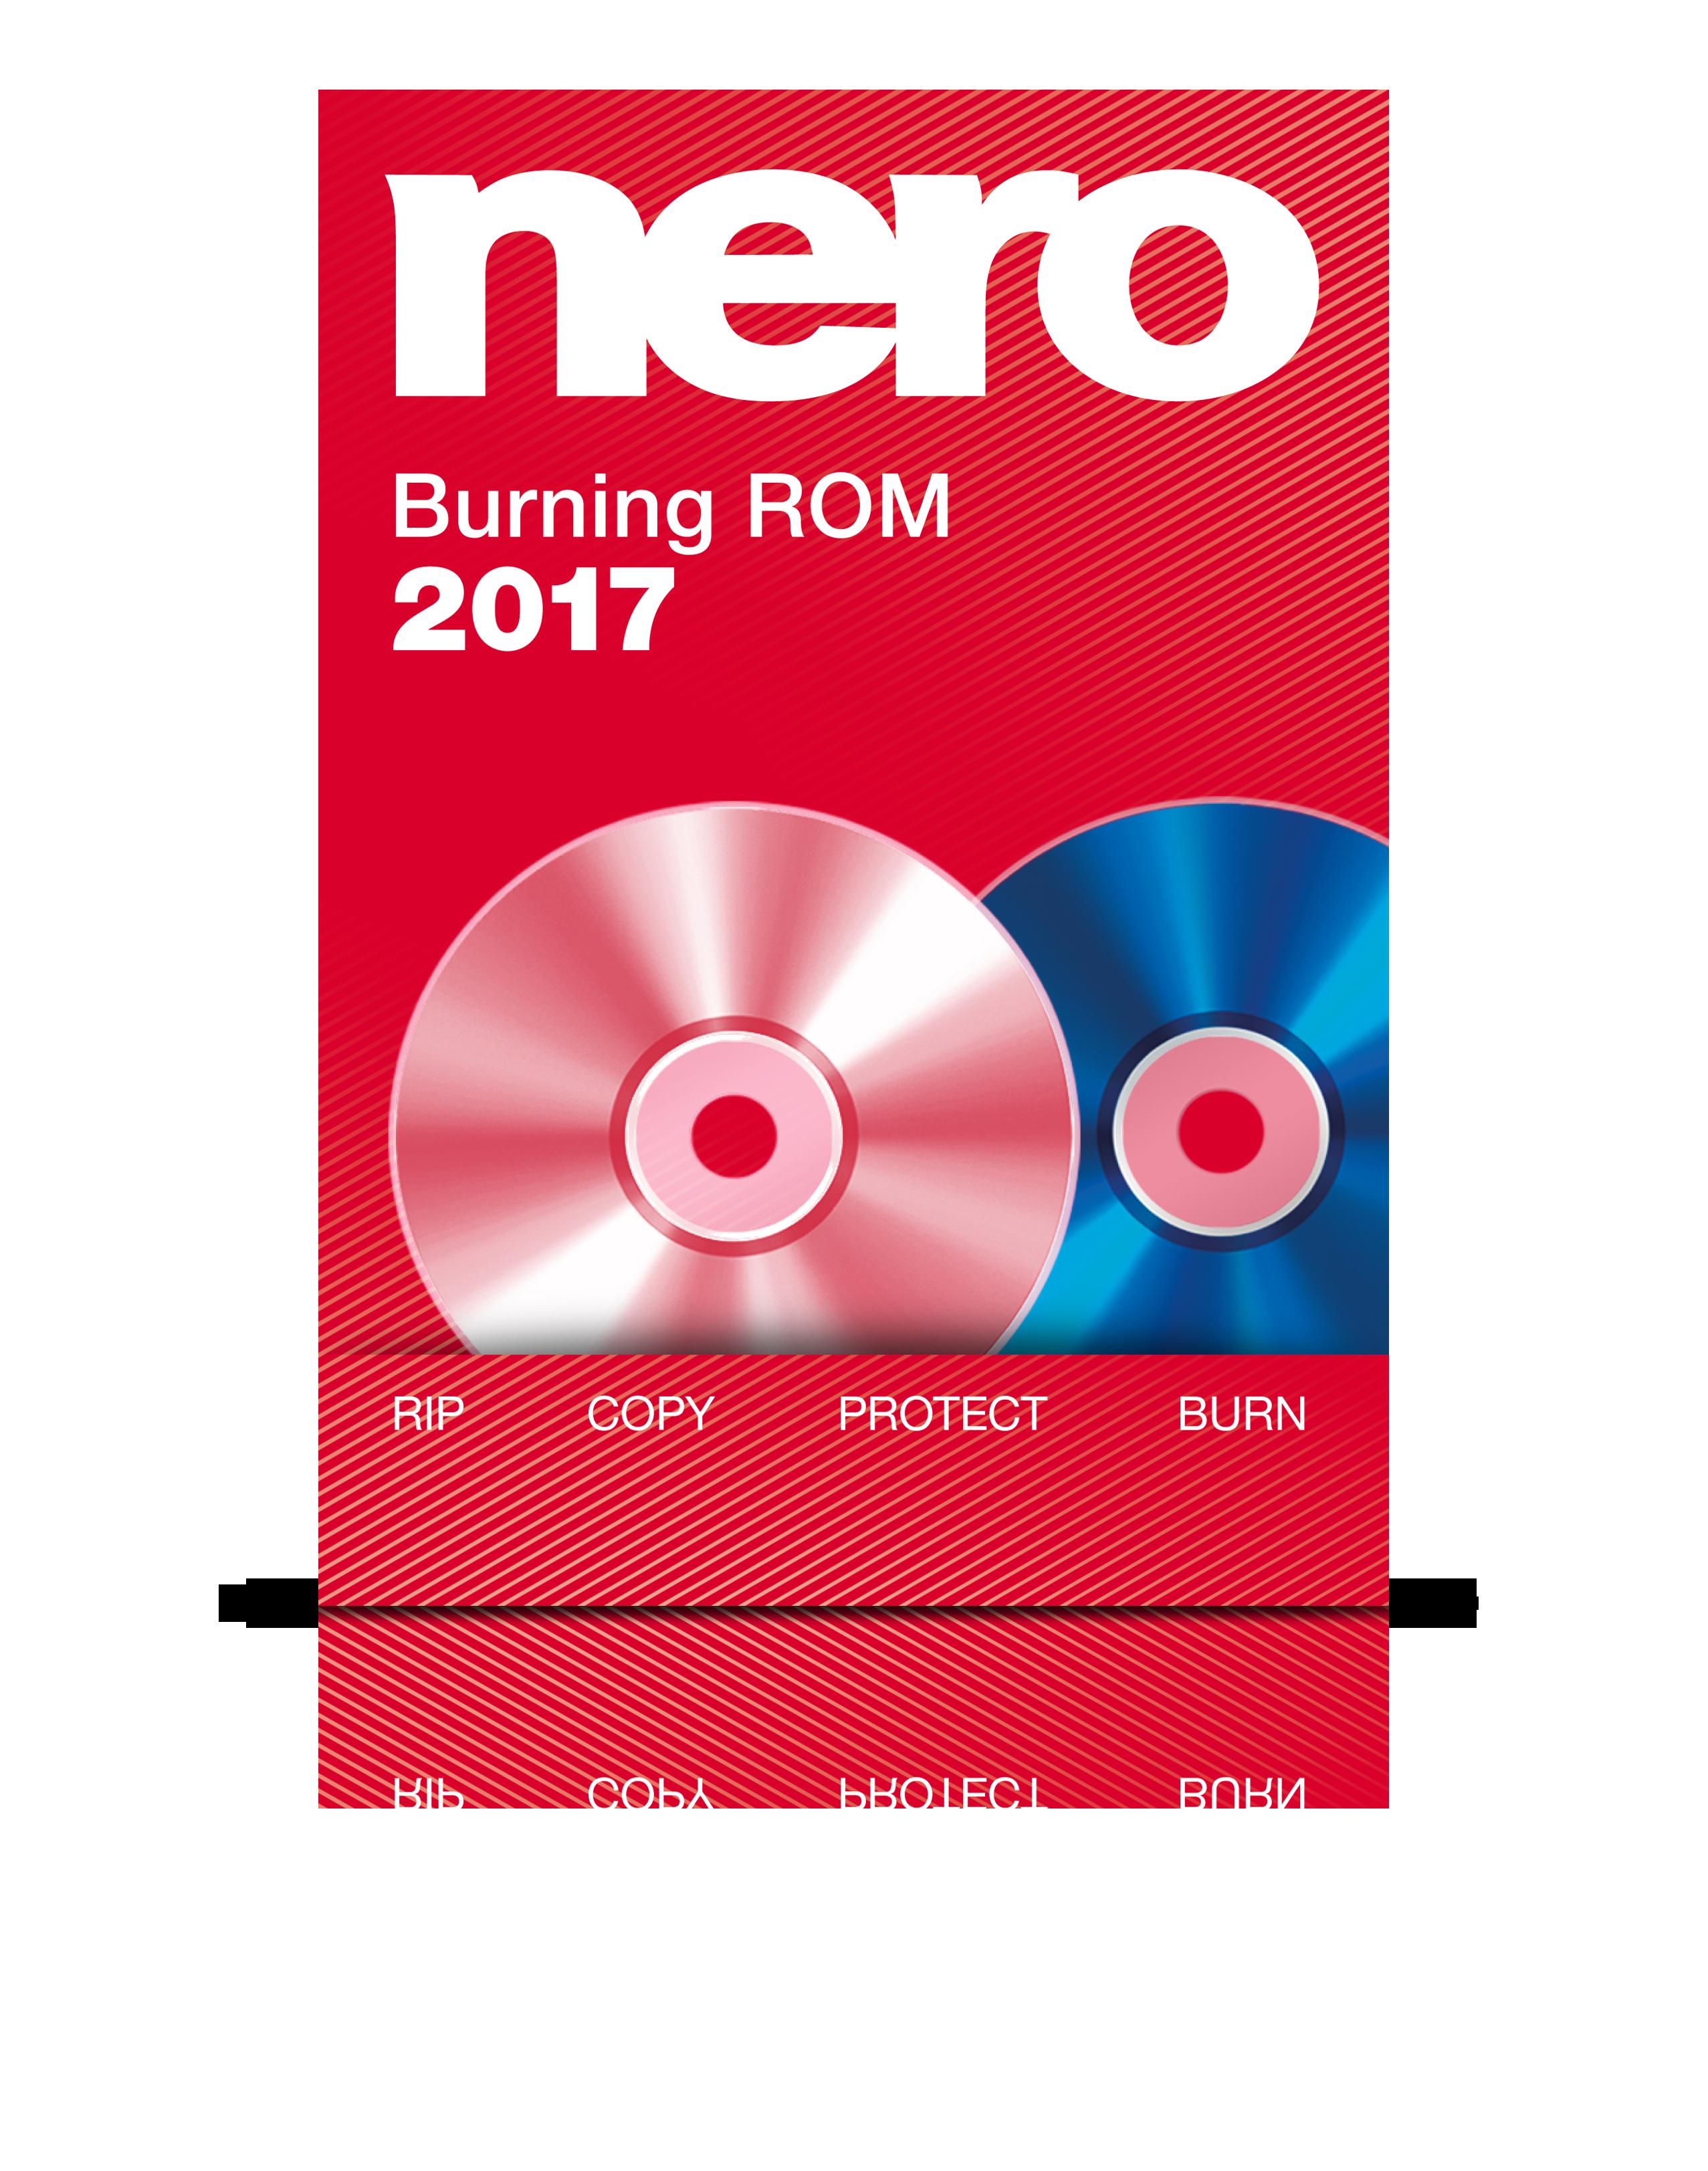 nero-2017-burning-rom-download